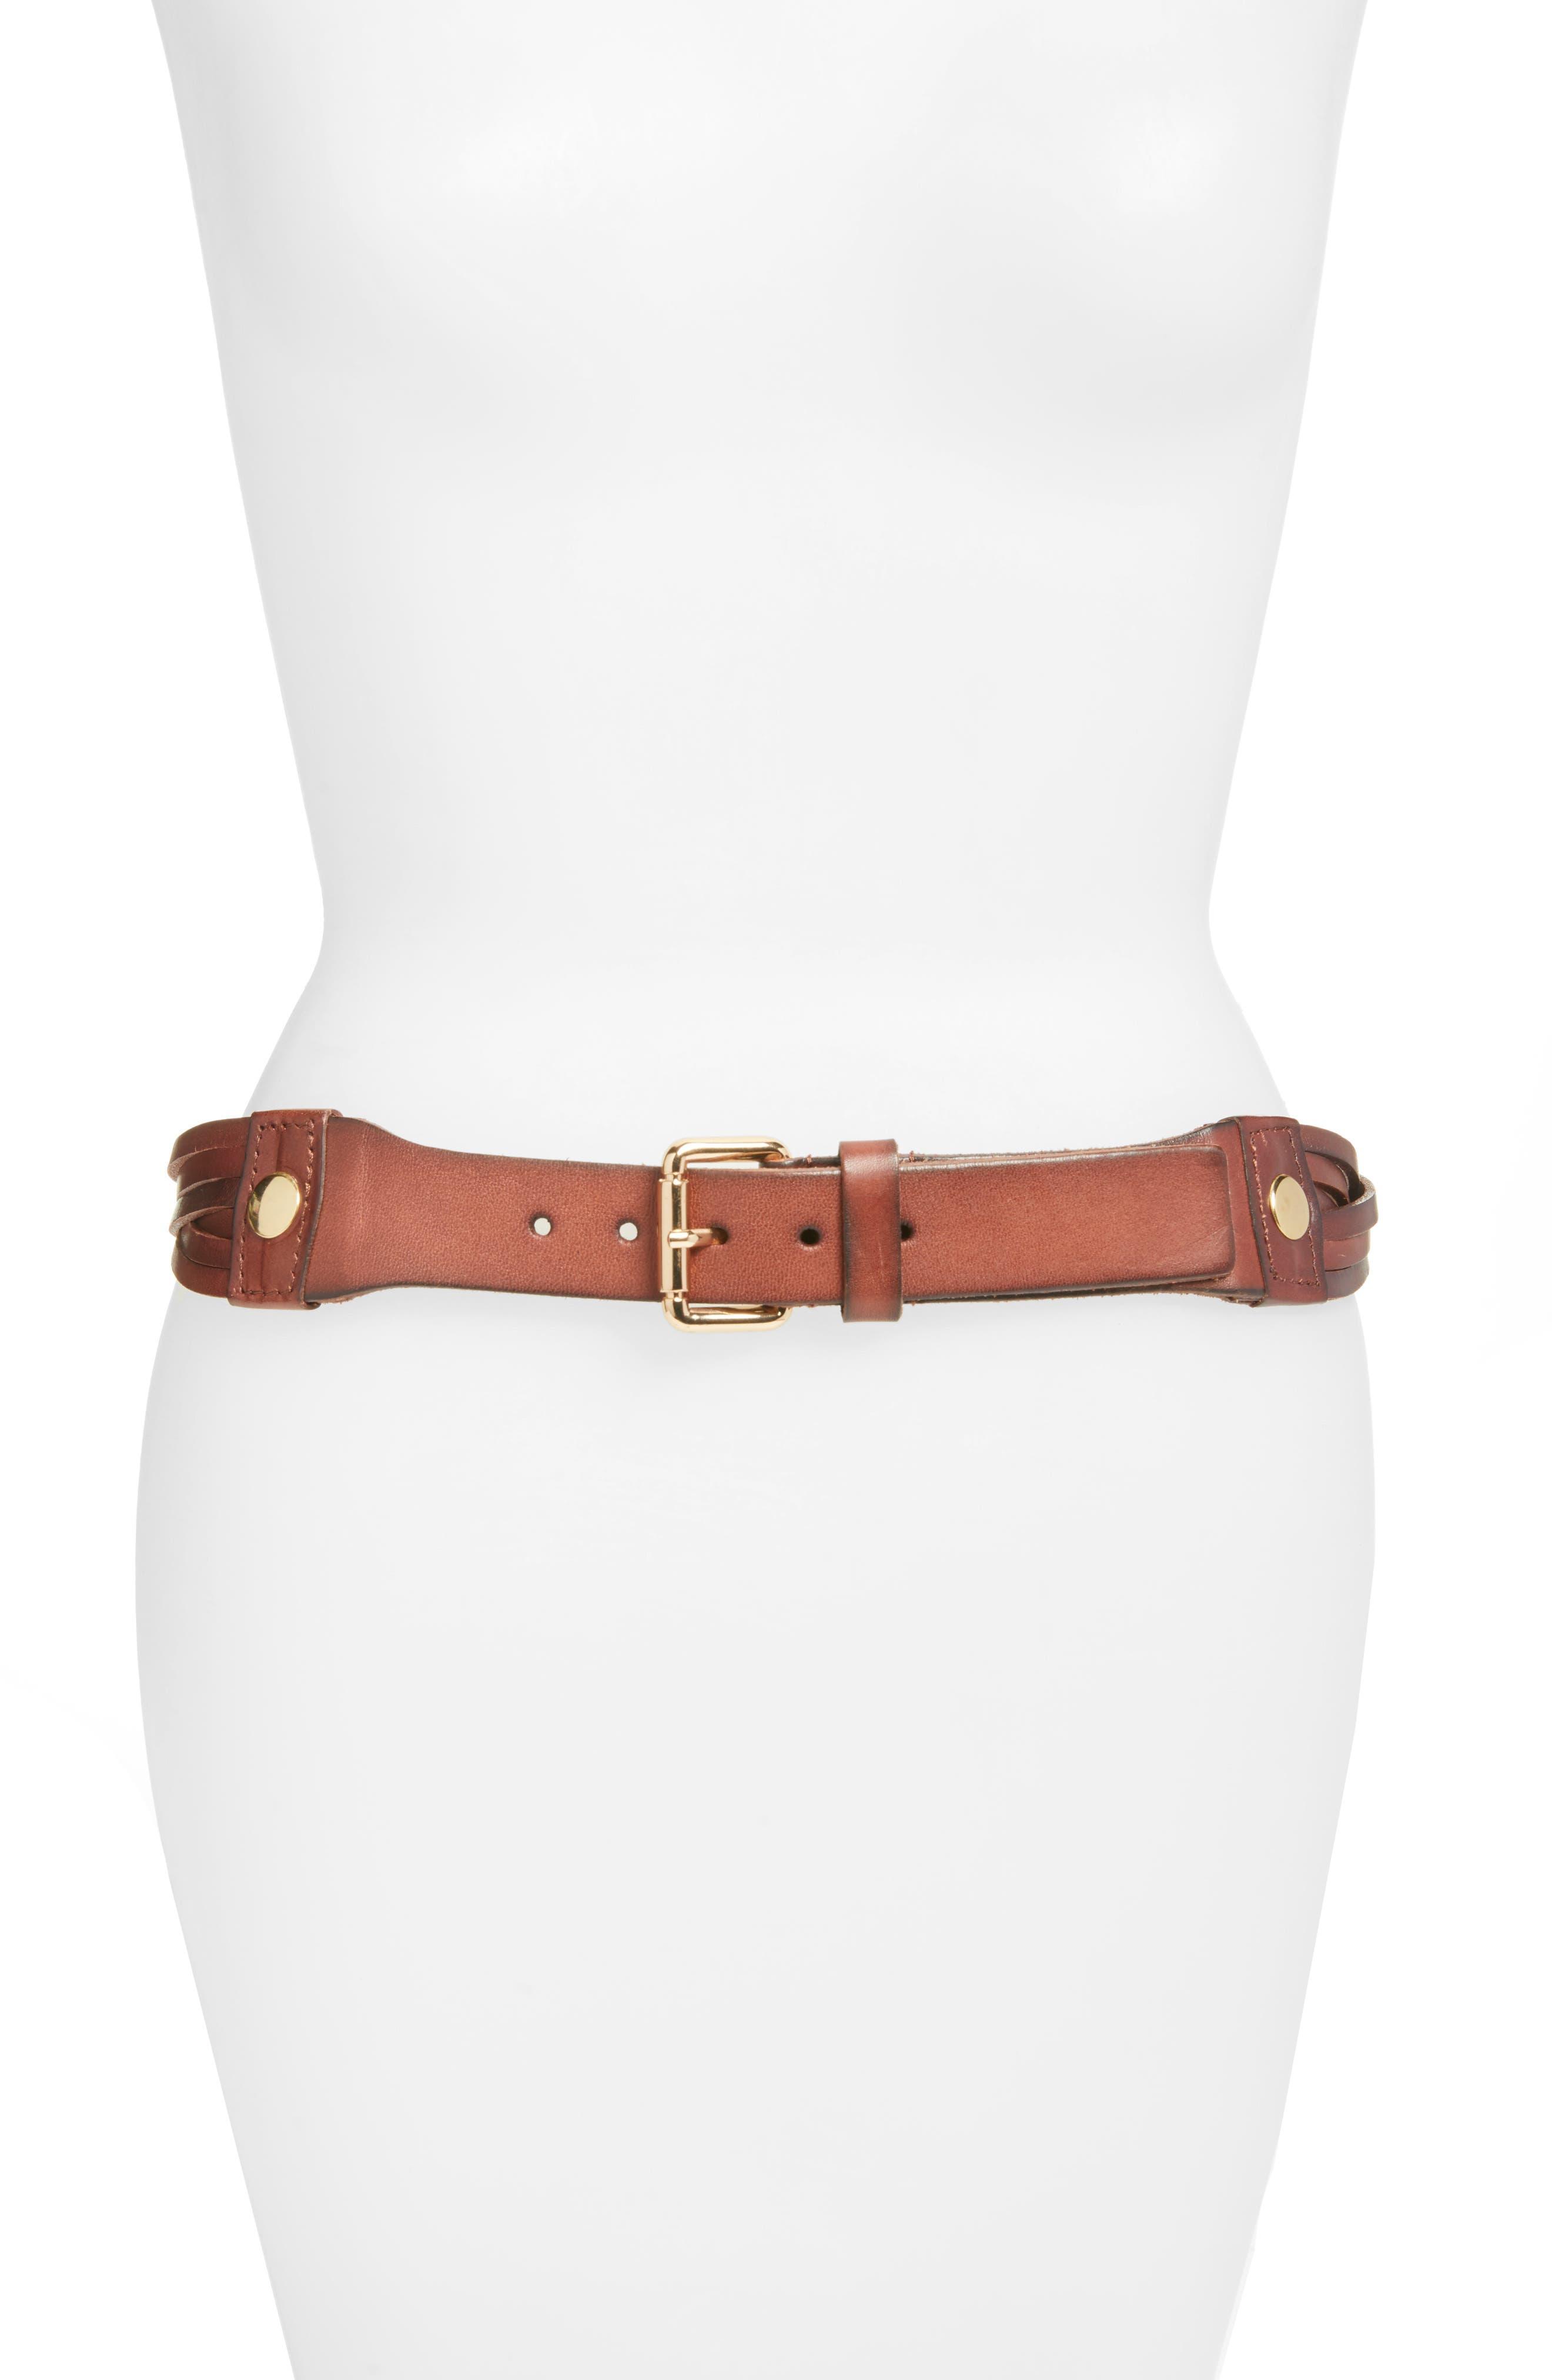 ELISE M. Hunter Twisted Leather Hip Belt in Capp